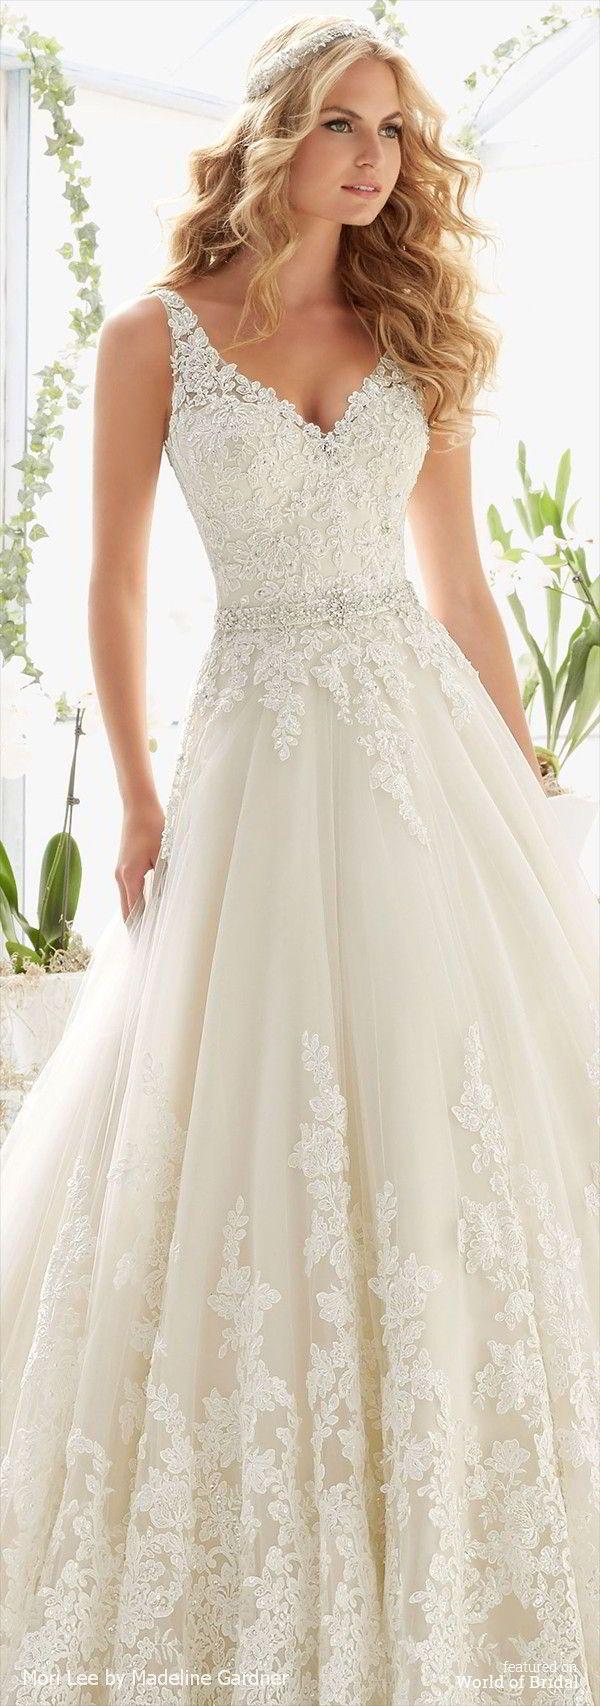 Mori Lee by Madeline Gardner Spring 2016 Wedding Dresses ...